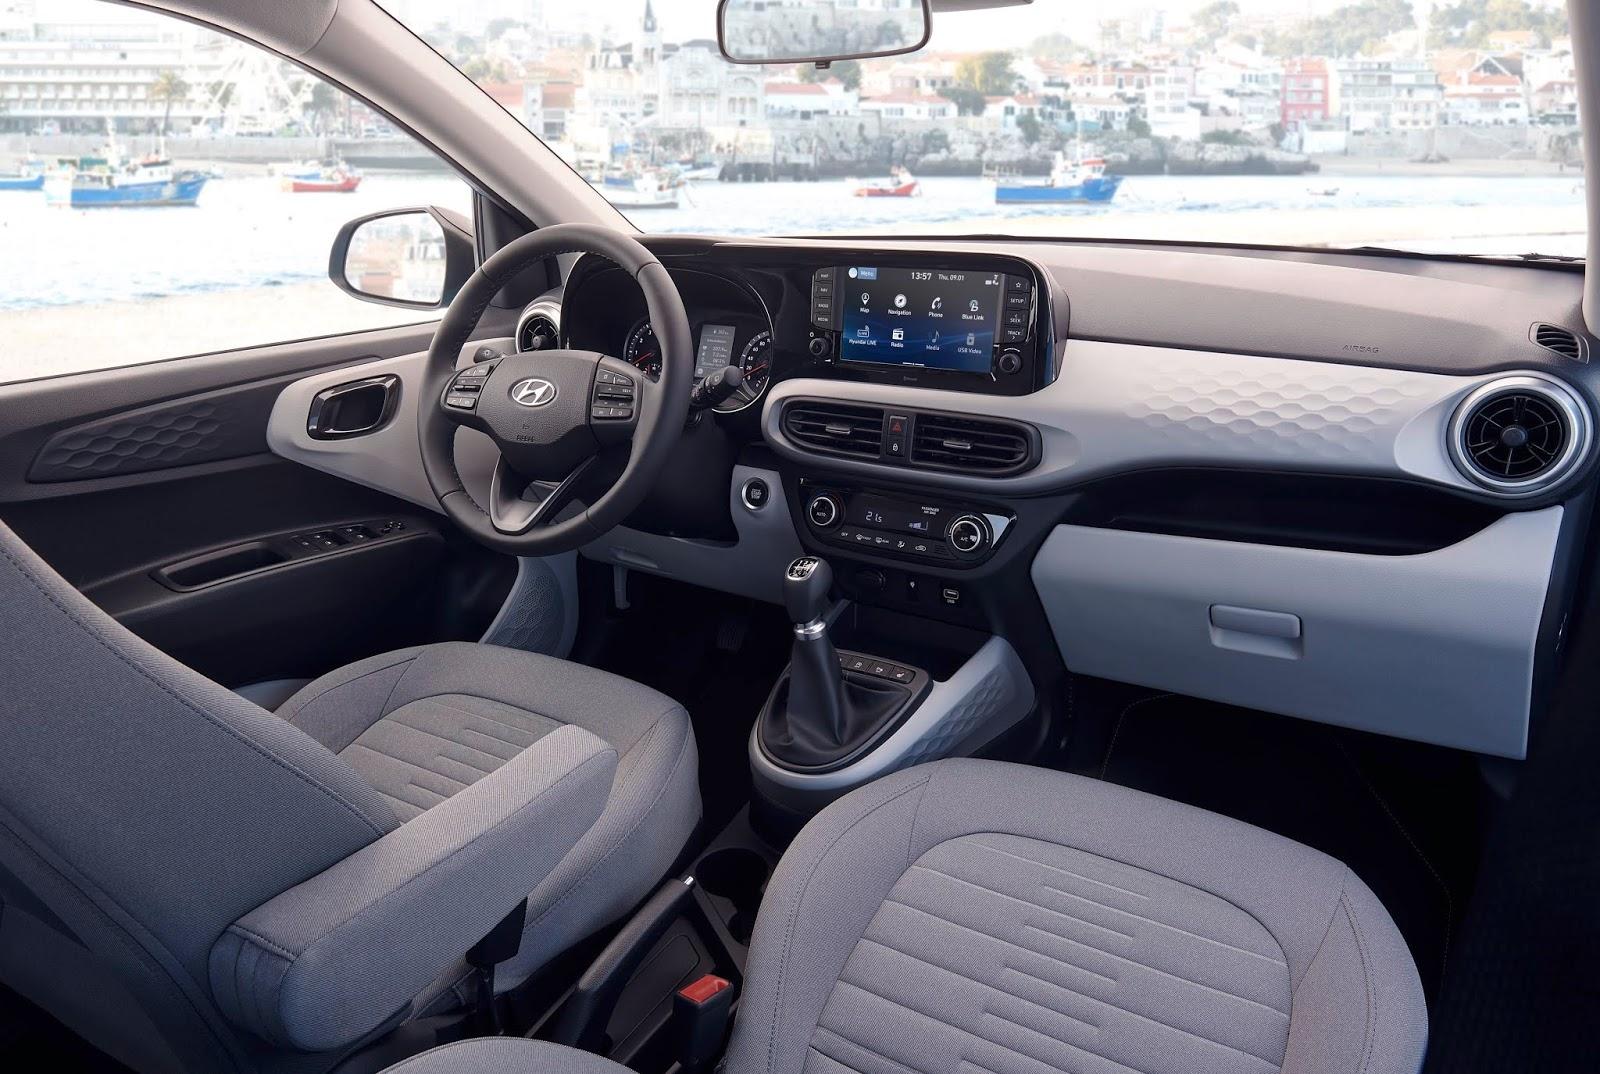 Hyundai2Bi102Binterior2B252812529 L Η Hyundai... φορτώνει με τεχνολογία το i10 Hyundai, Hyundai i10, αγορά, καινούρια